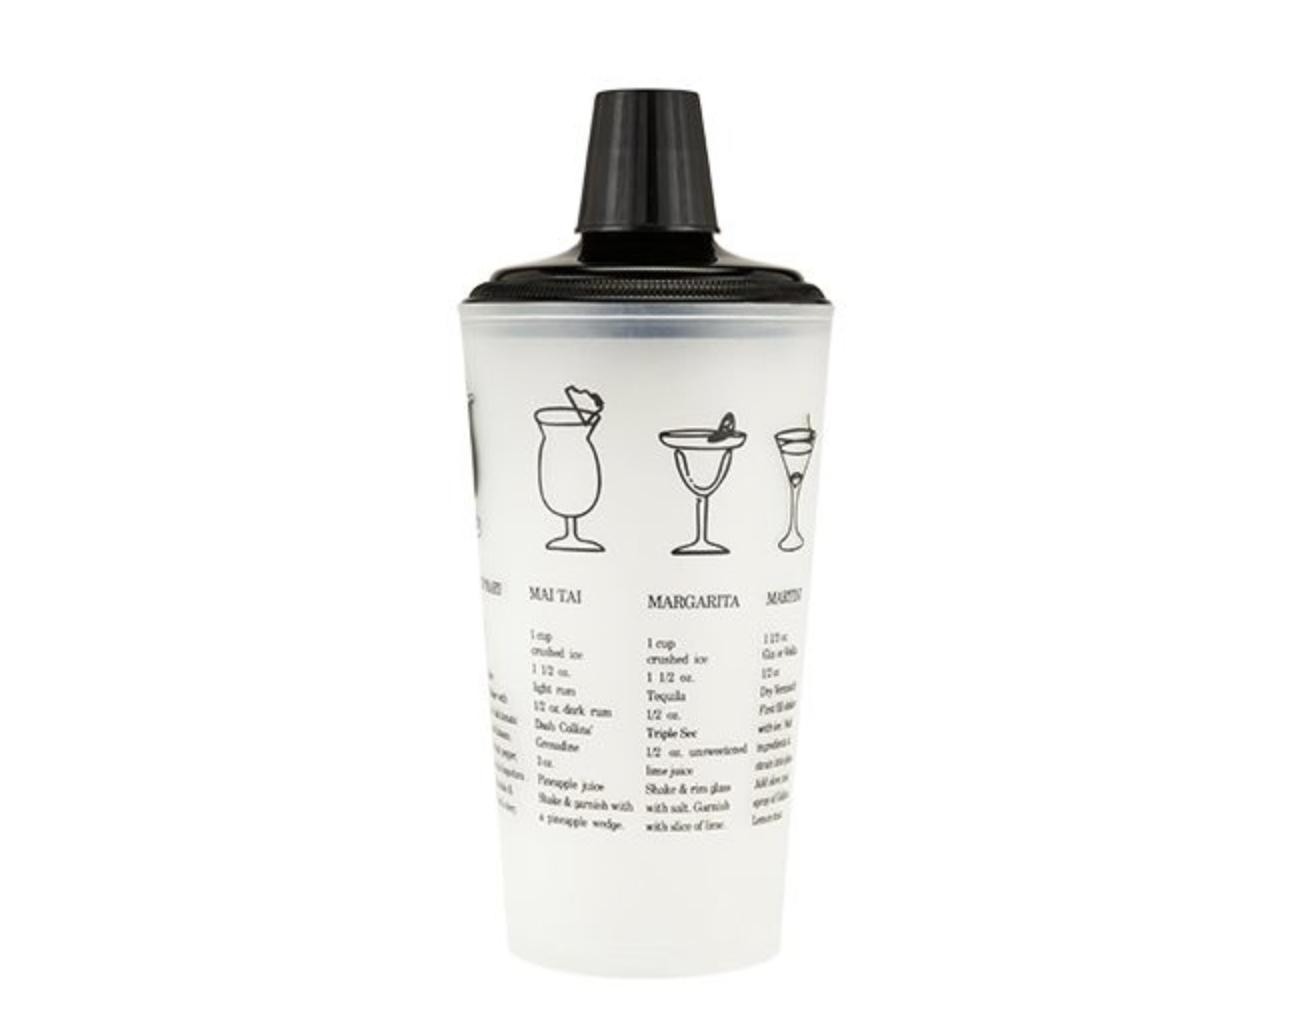 True 30oz Black Recipe Shaker